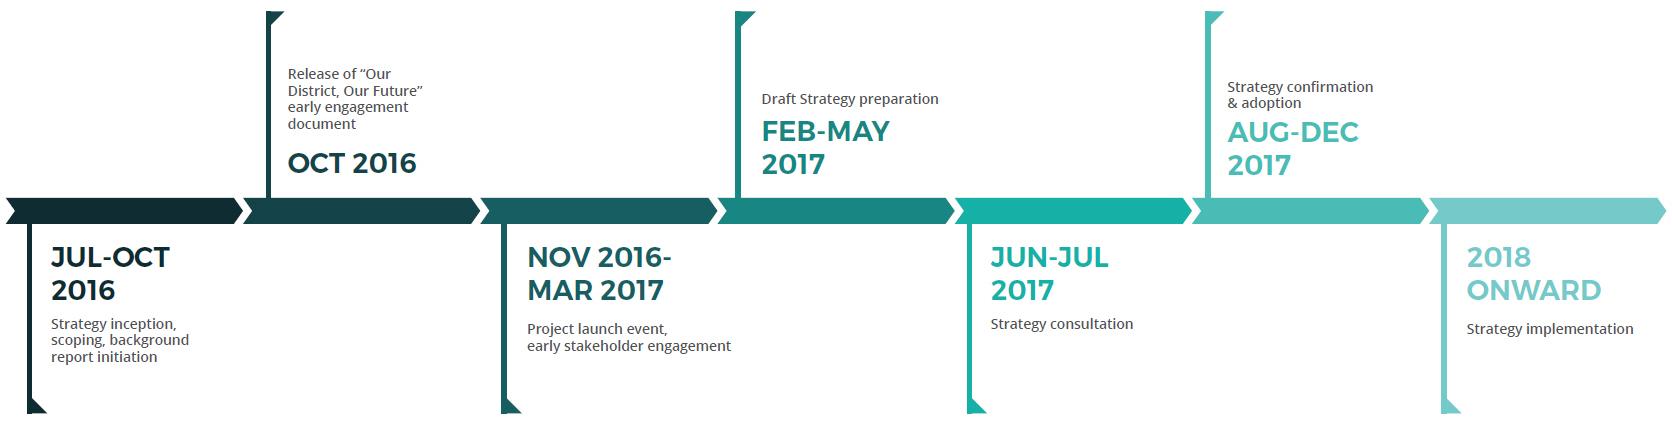 District Development Strategy Process